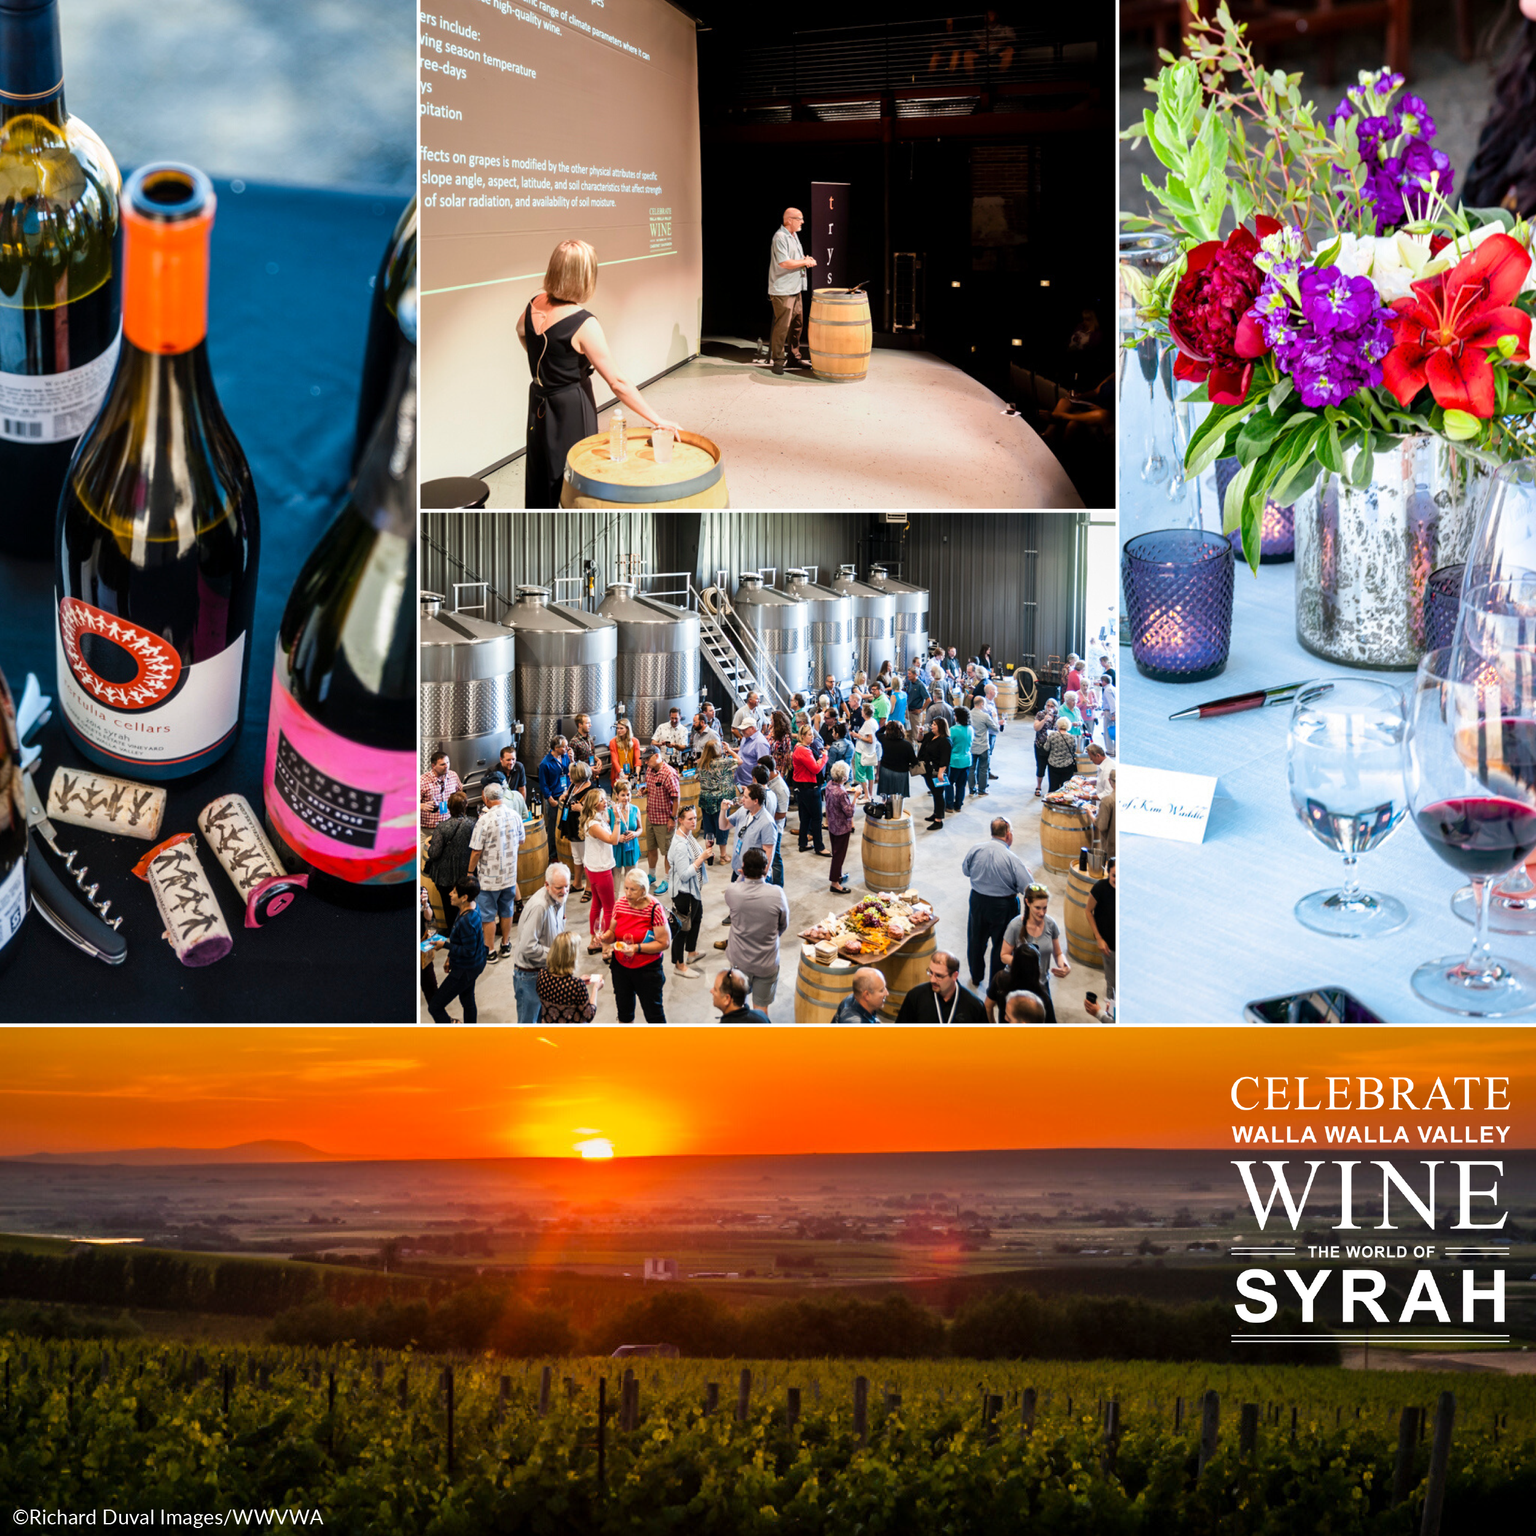 Celebrate 2020 - Celebrate Walla Walla Valley Wine - The World of Syrah